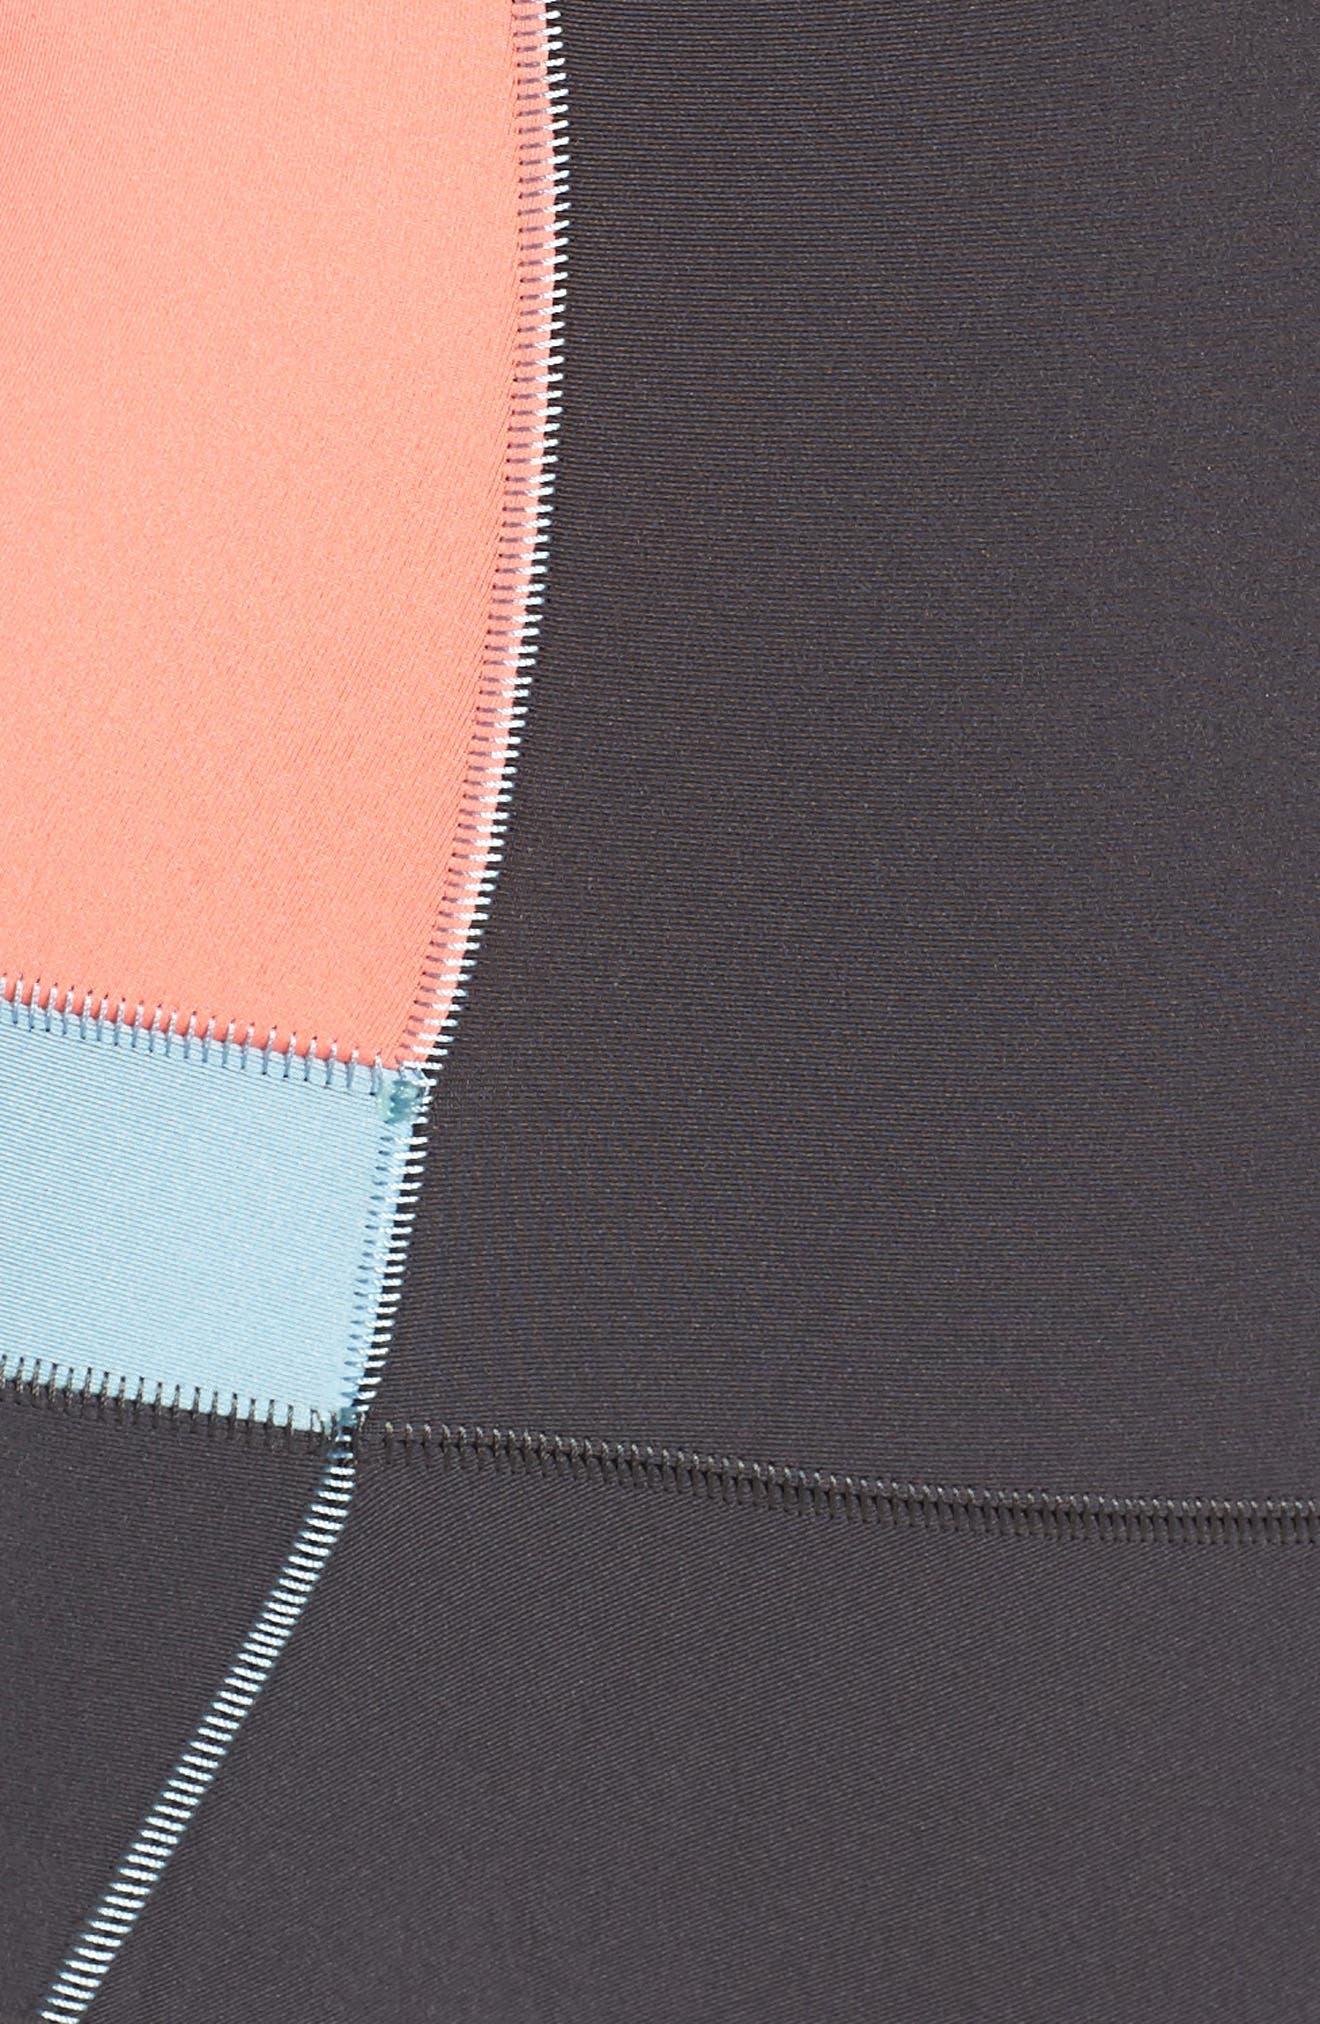 G-Bomb Long Sleeve Wetsuit,                             Alternate thumbnail 7, color,